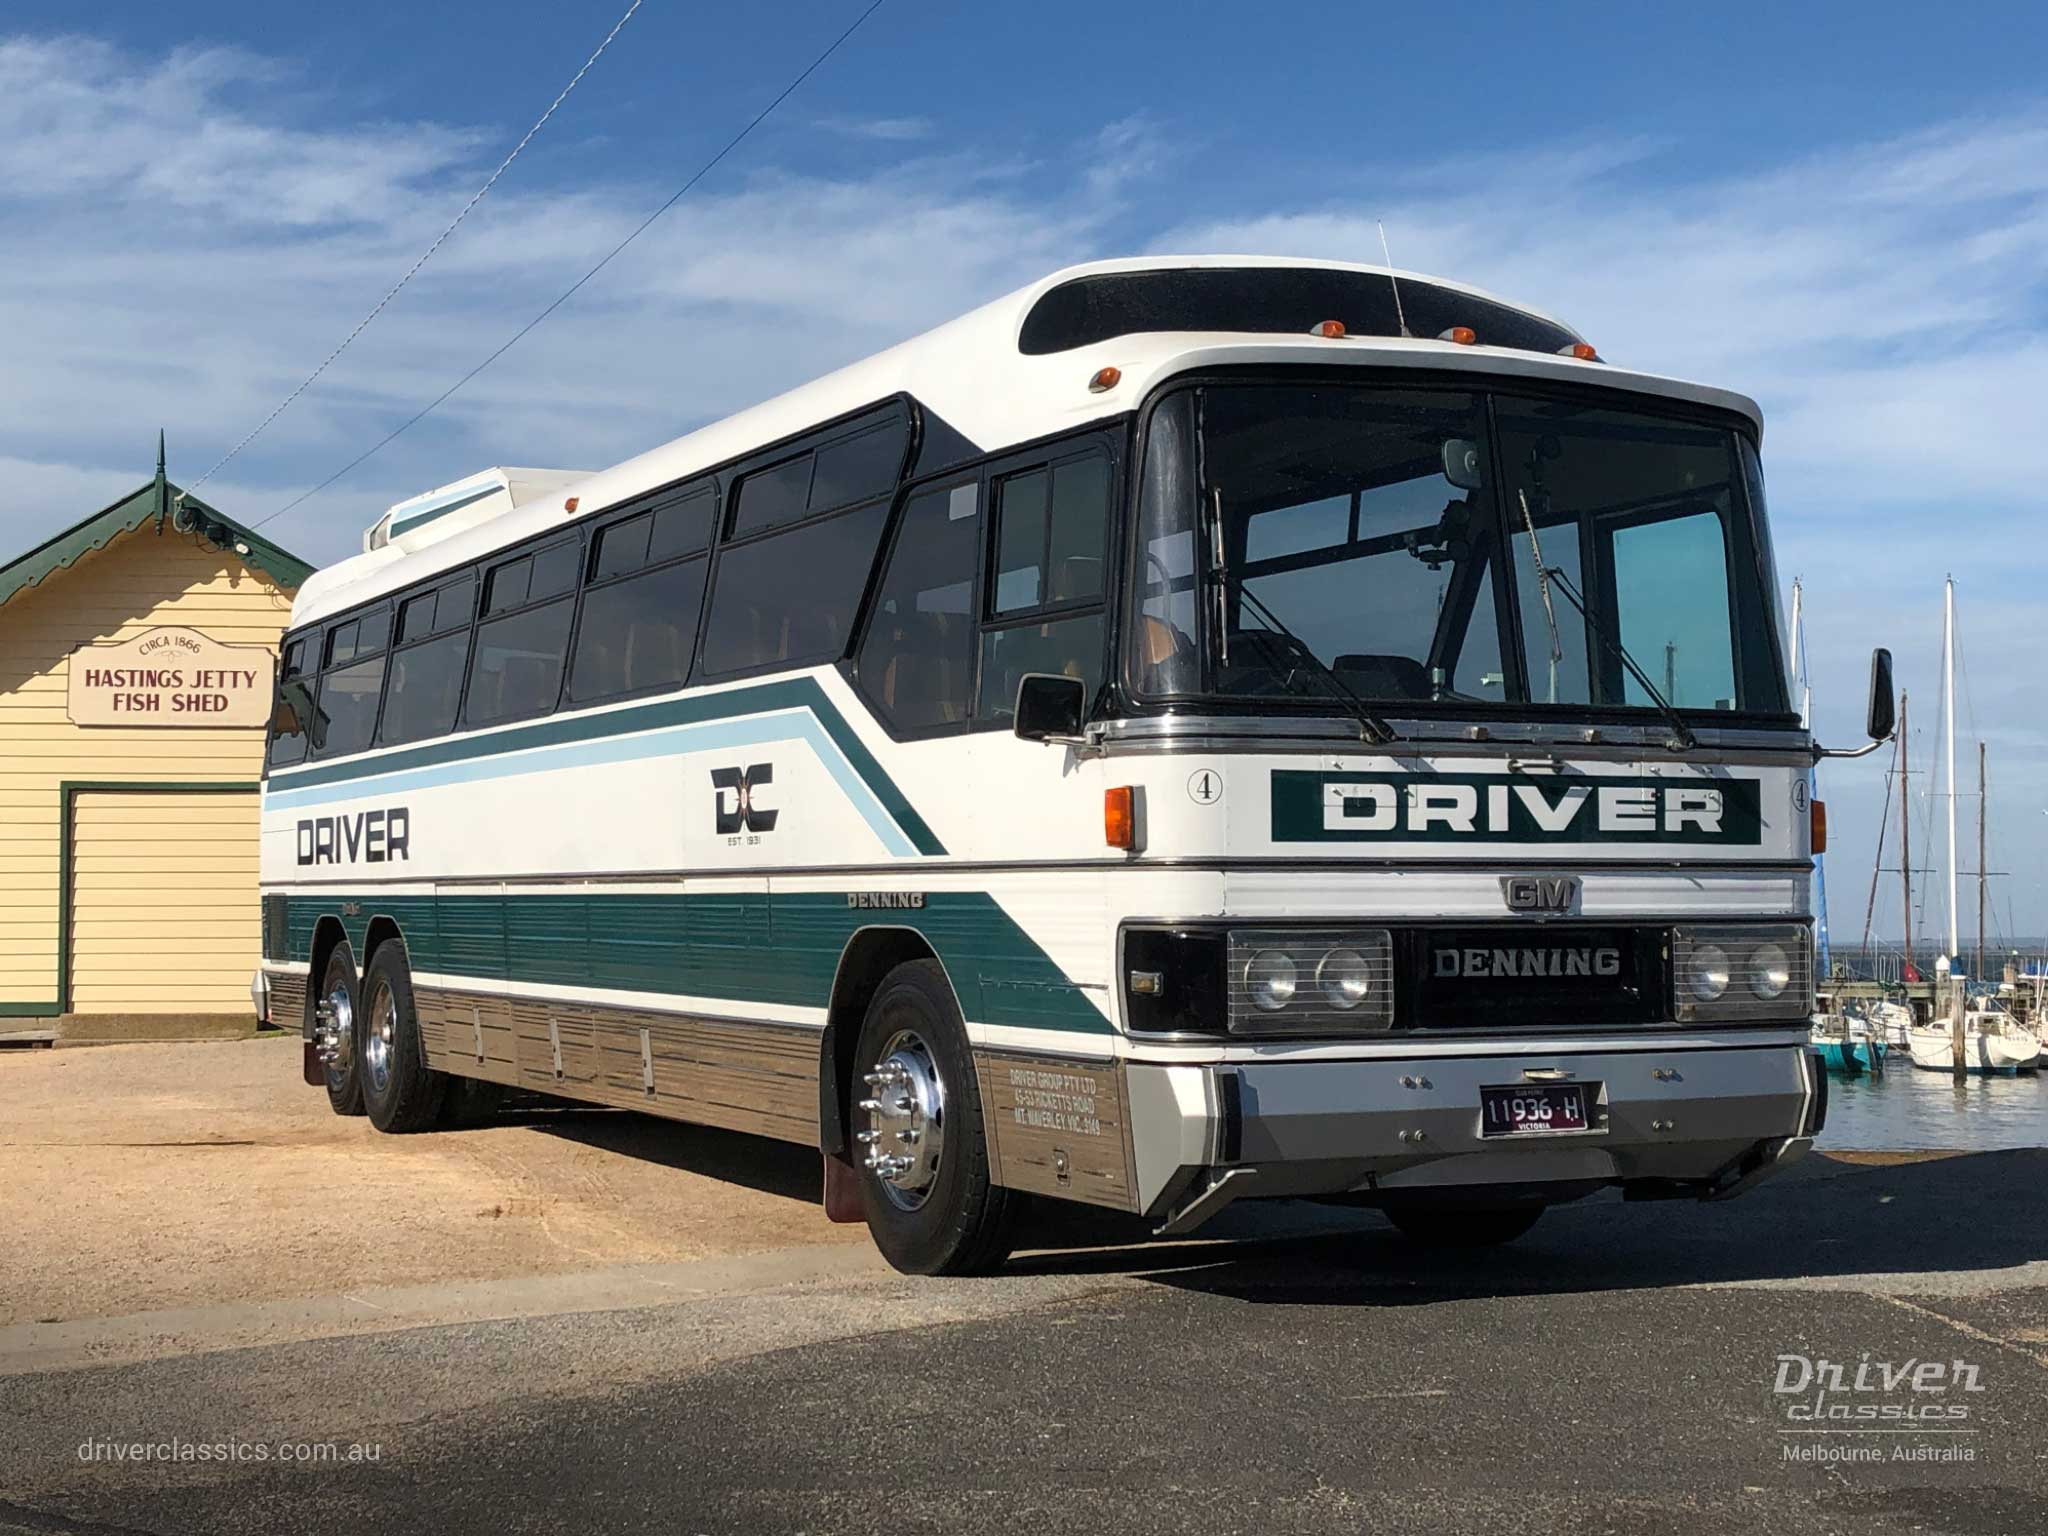 GM Denning DenAir Mono Bus, 1983 version, close up, at Hastings Jetty, Hastings VIC. Photo taken April 2019.